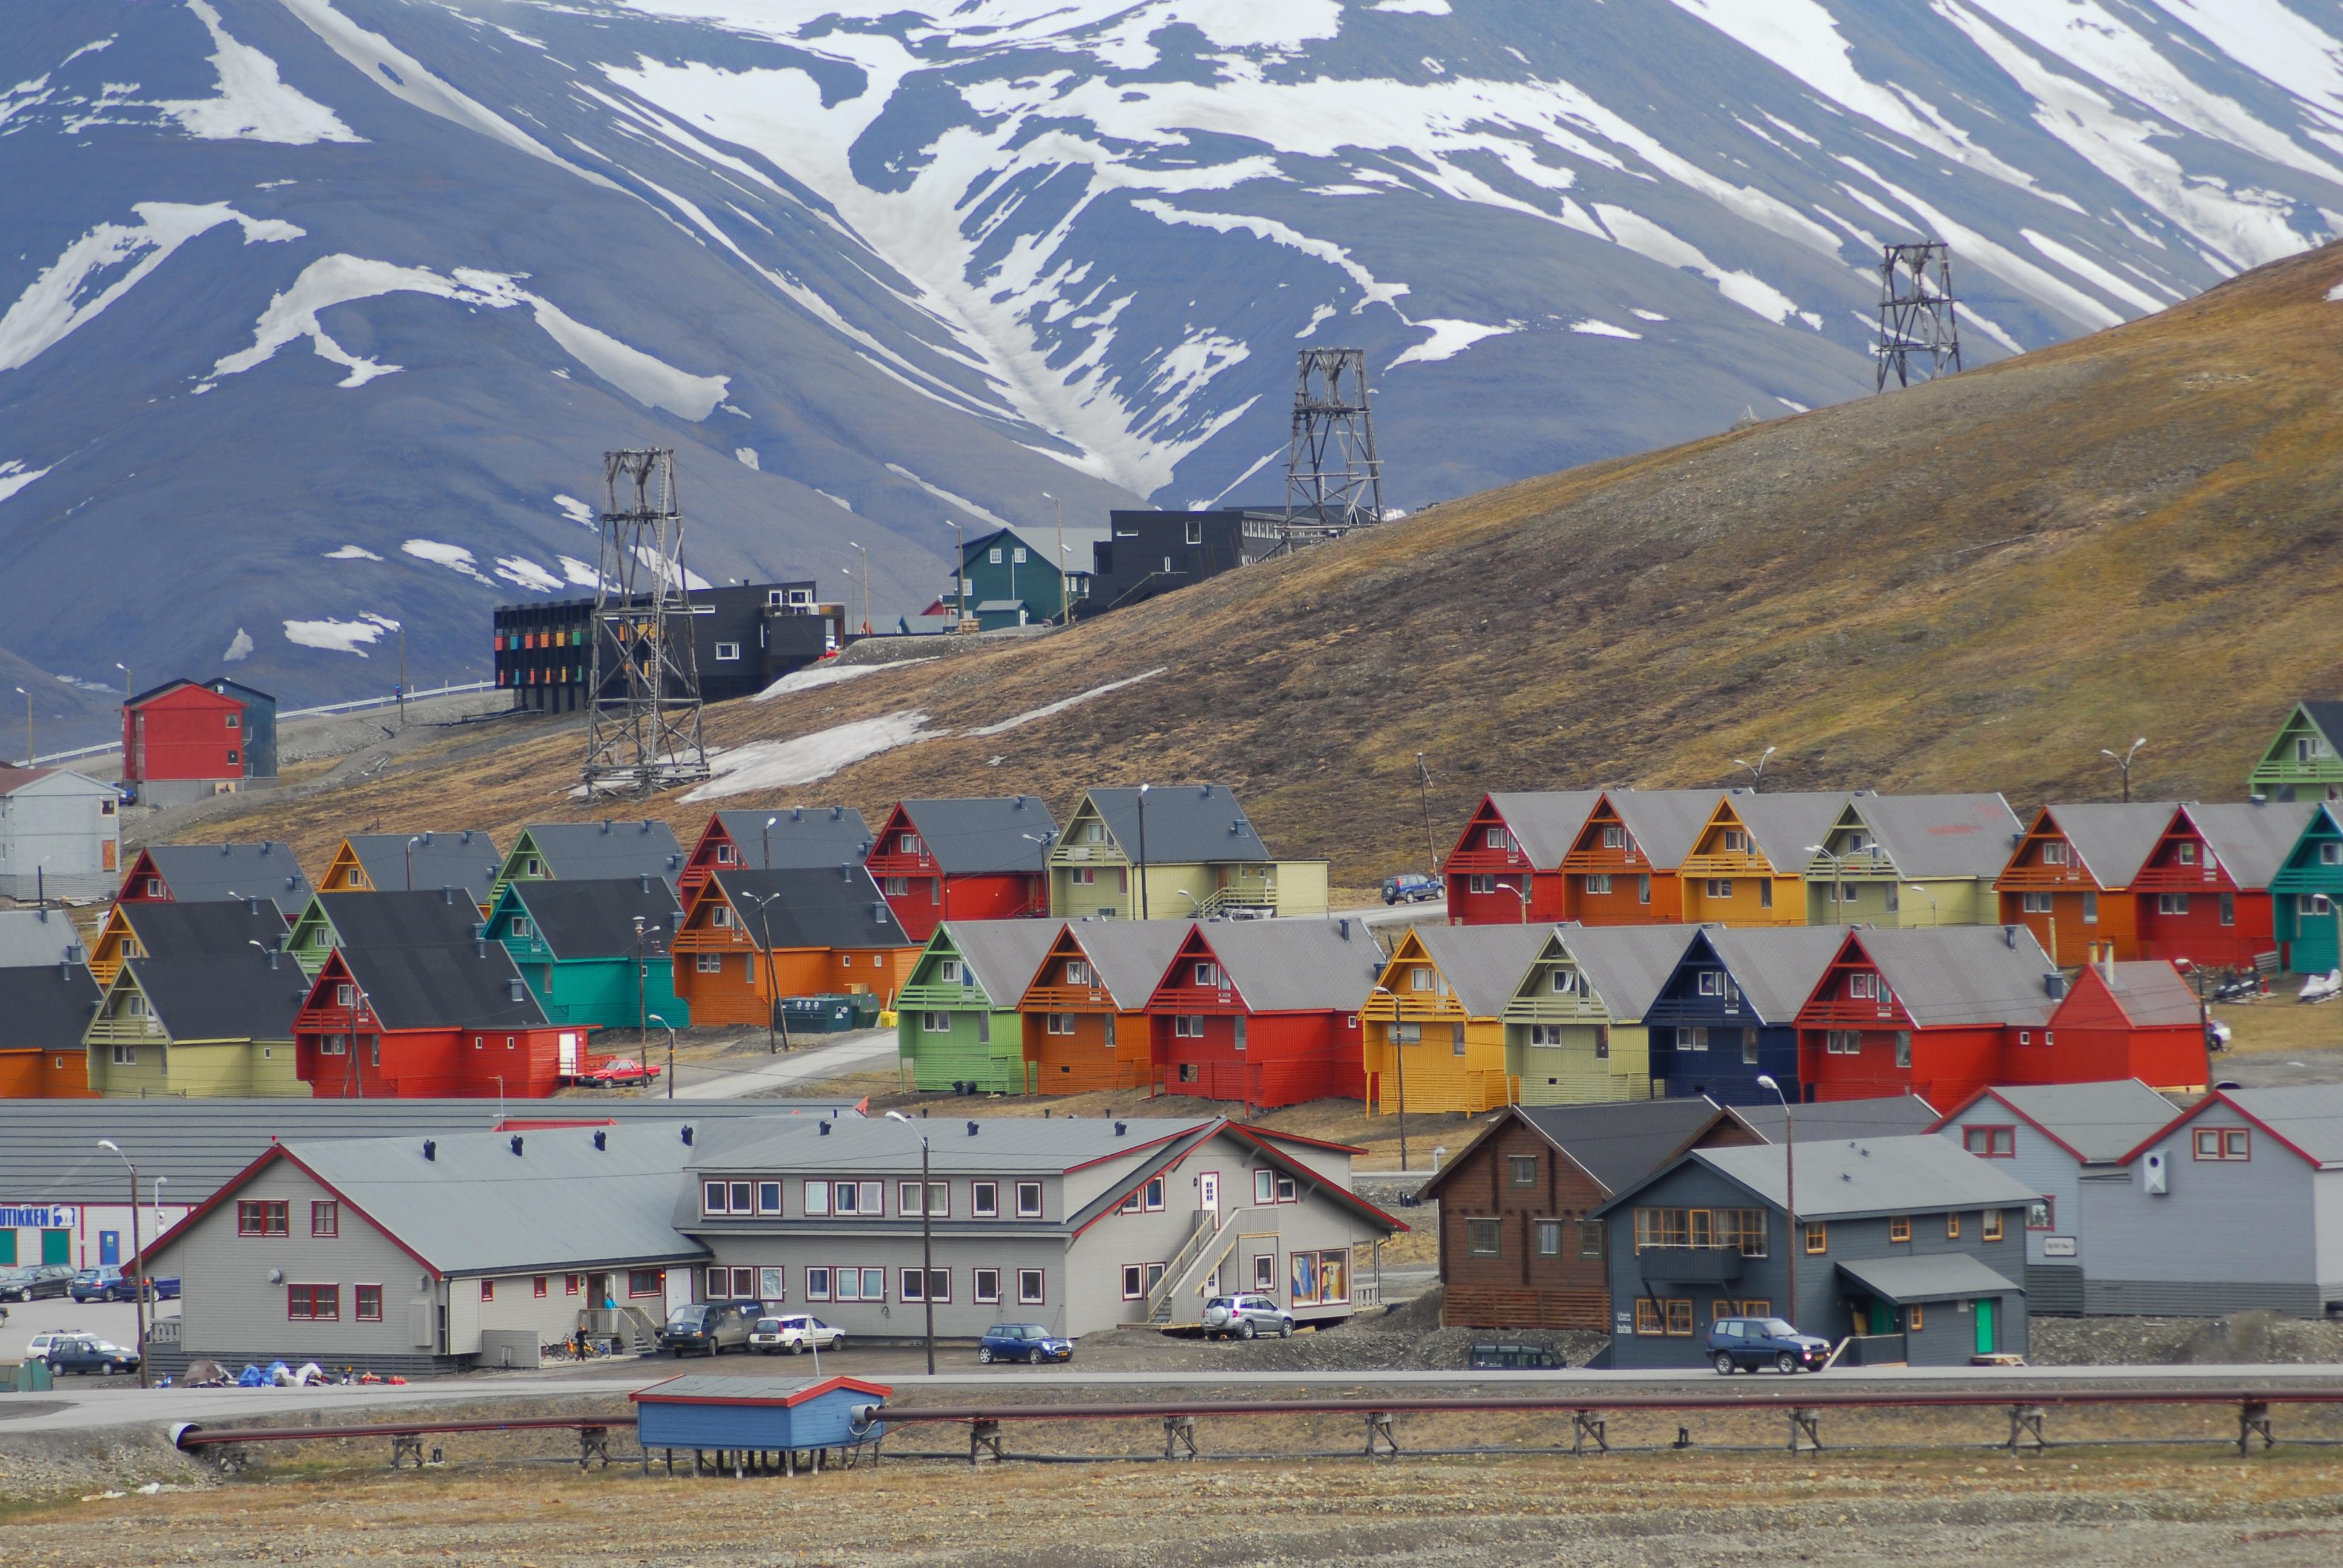 http://upload.wikimedia.org/wikipedia/commons/7/7b/Longyearbyen_colourful_homes.jpg